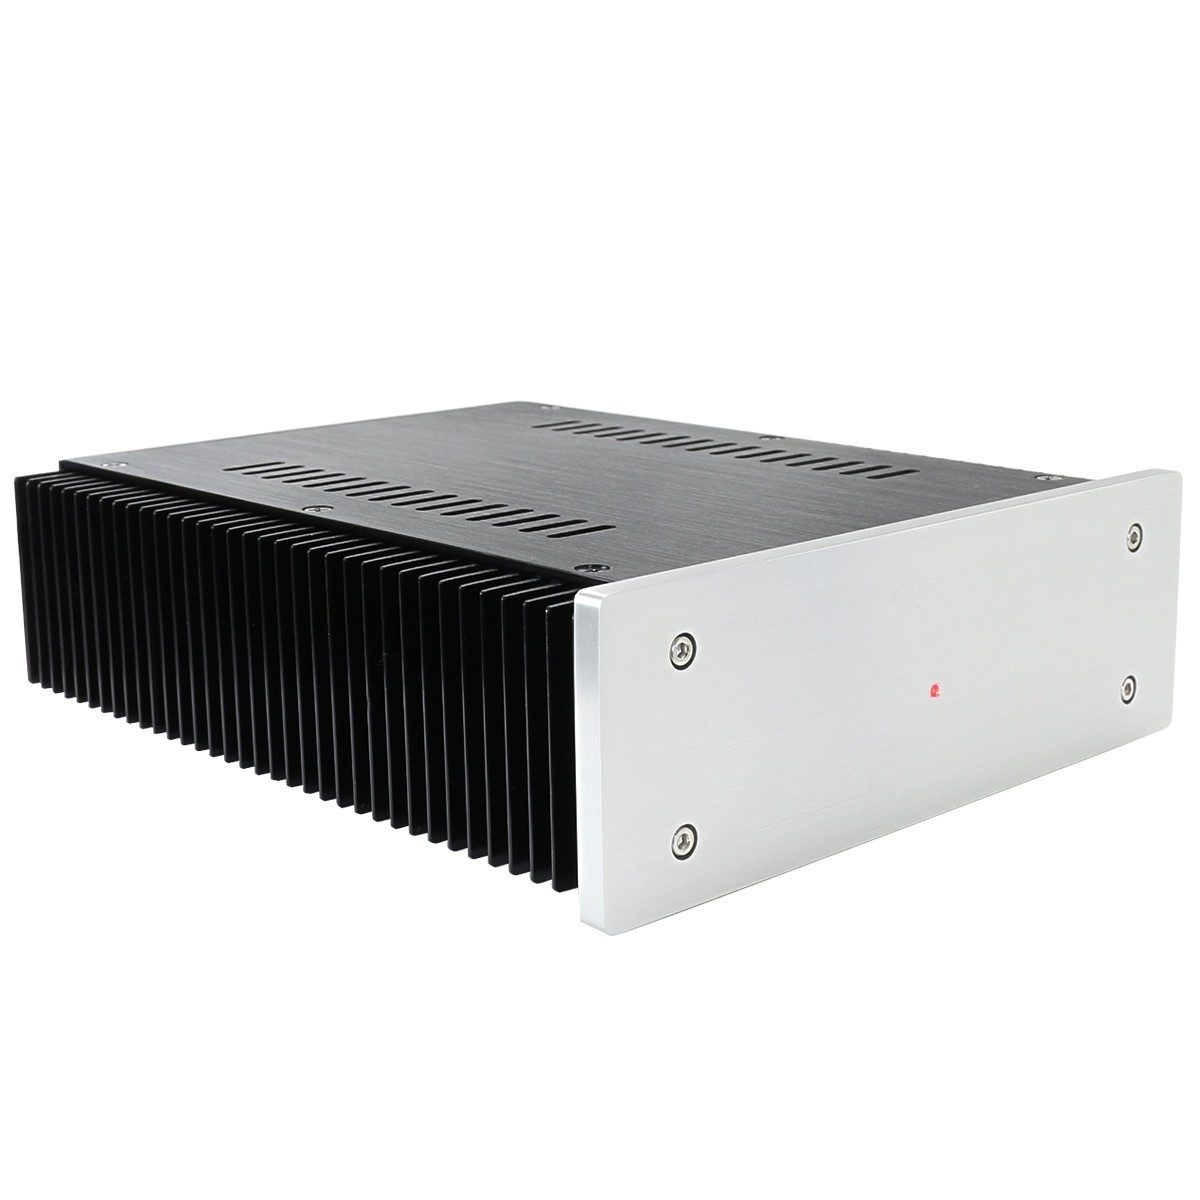 LPSU200 HiFi Linear stabilized power supply 12V + 5V 5A 200W NAS / Freebox / Squeezebox